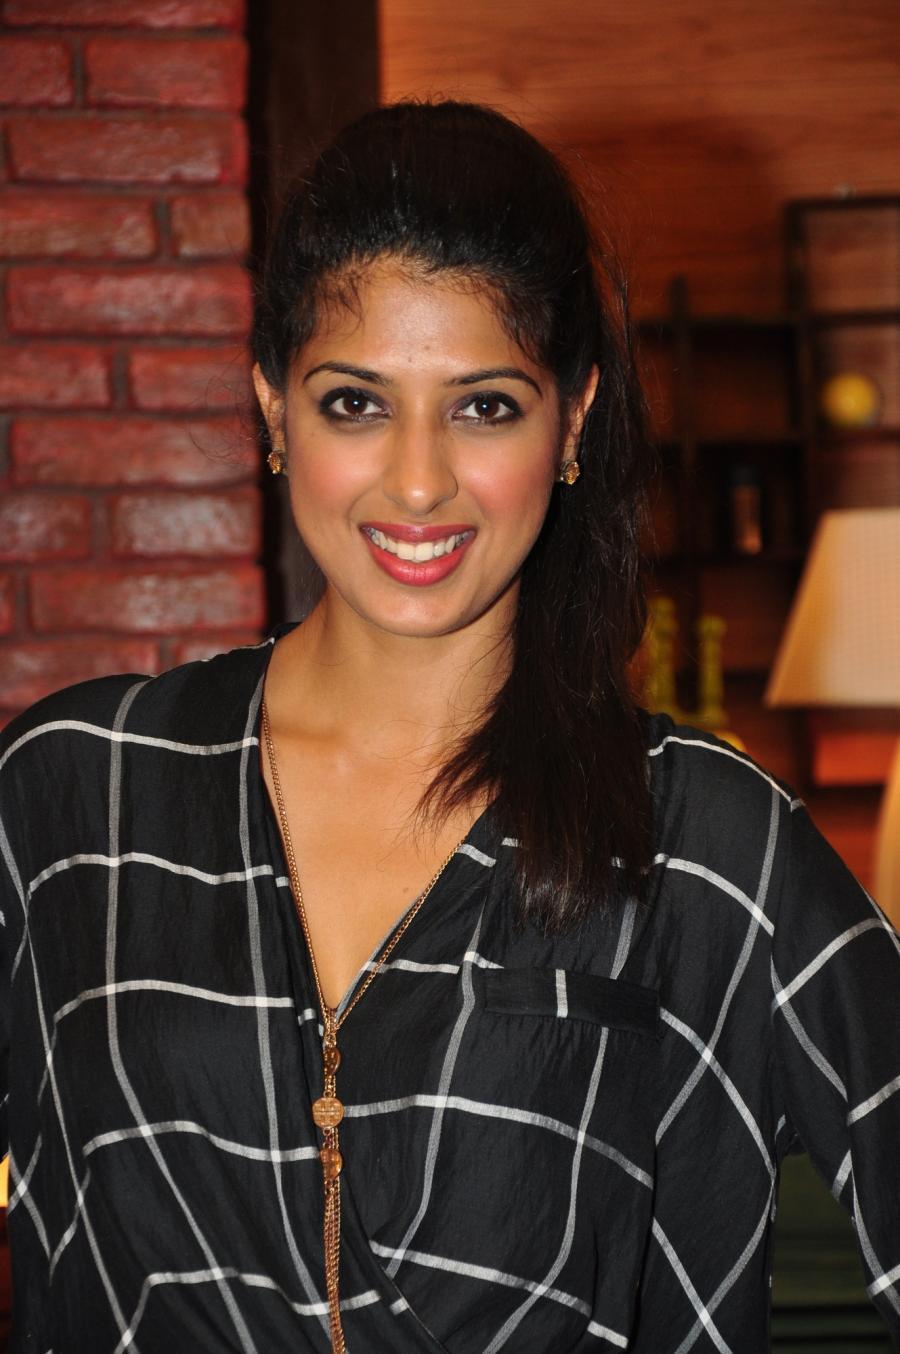 Hindi TV Actress Aishwarya Sakhuja Photos In Black Shirt At Nach Baliye